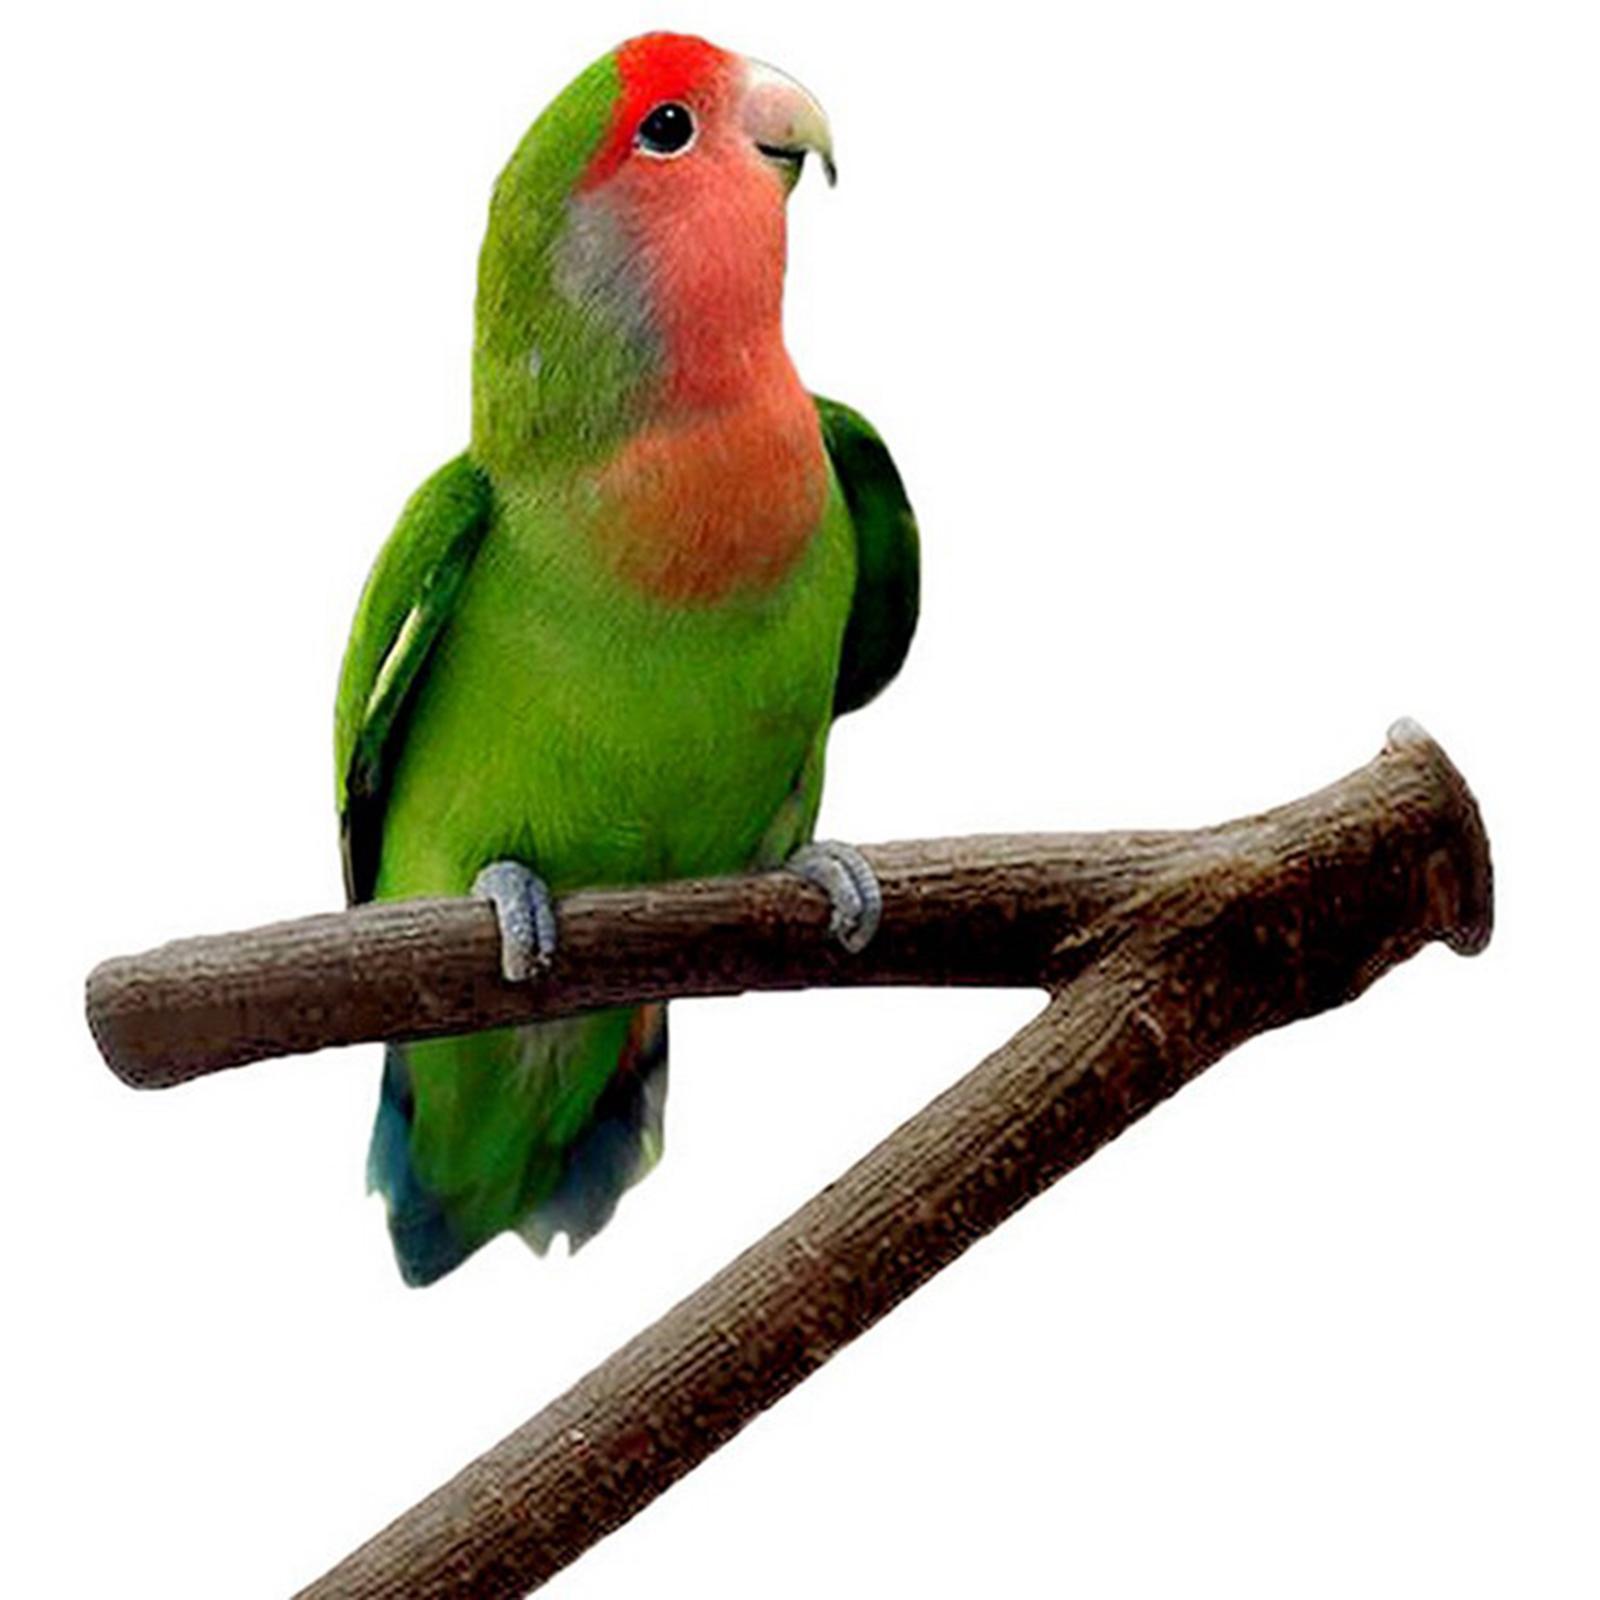 thumbnail 29 - Bird-Perch-Wood-Stand-Bird-Cage-Swing-Branch-for-Parrot-Parakeet-Cockatiel